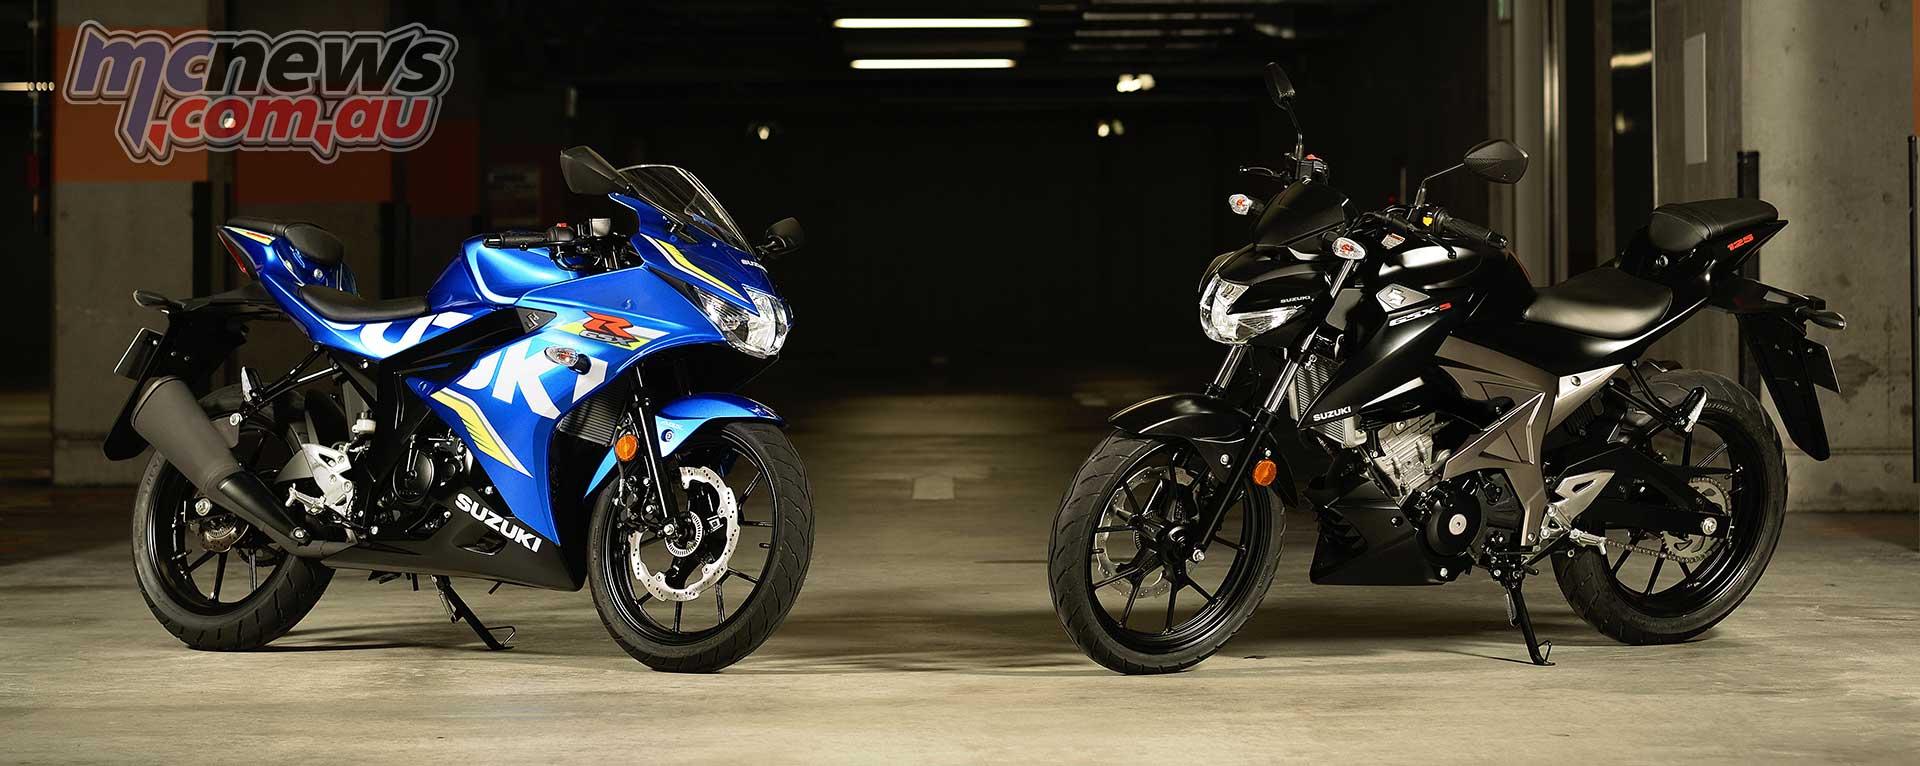 Suzuki GSX-S125 GSX-R125 Review | Motorcycle Test | MCNews com au